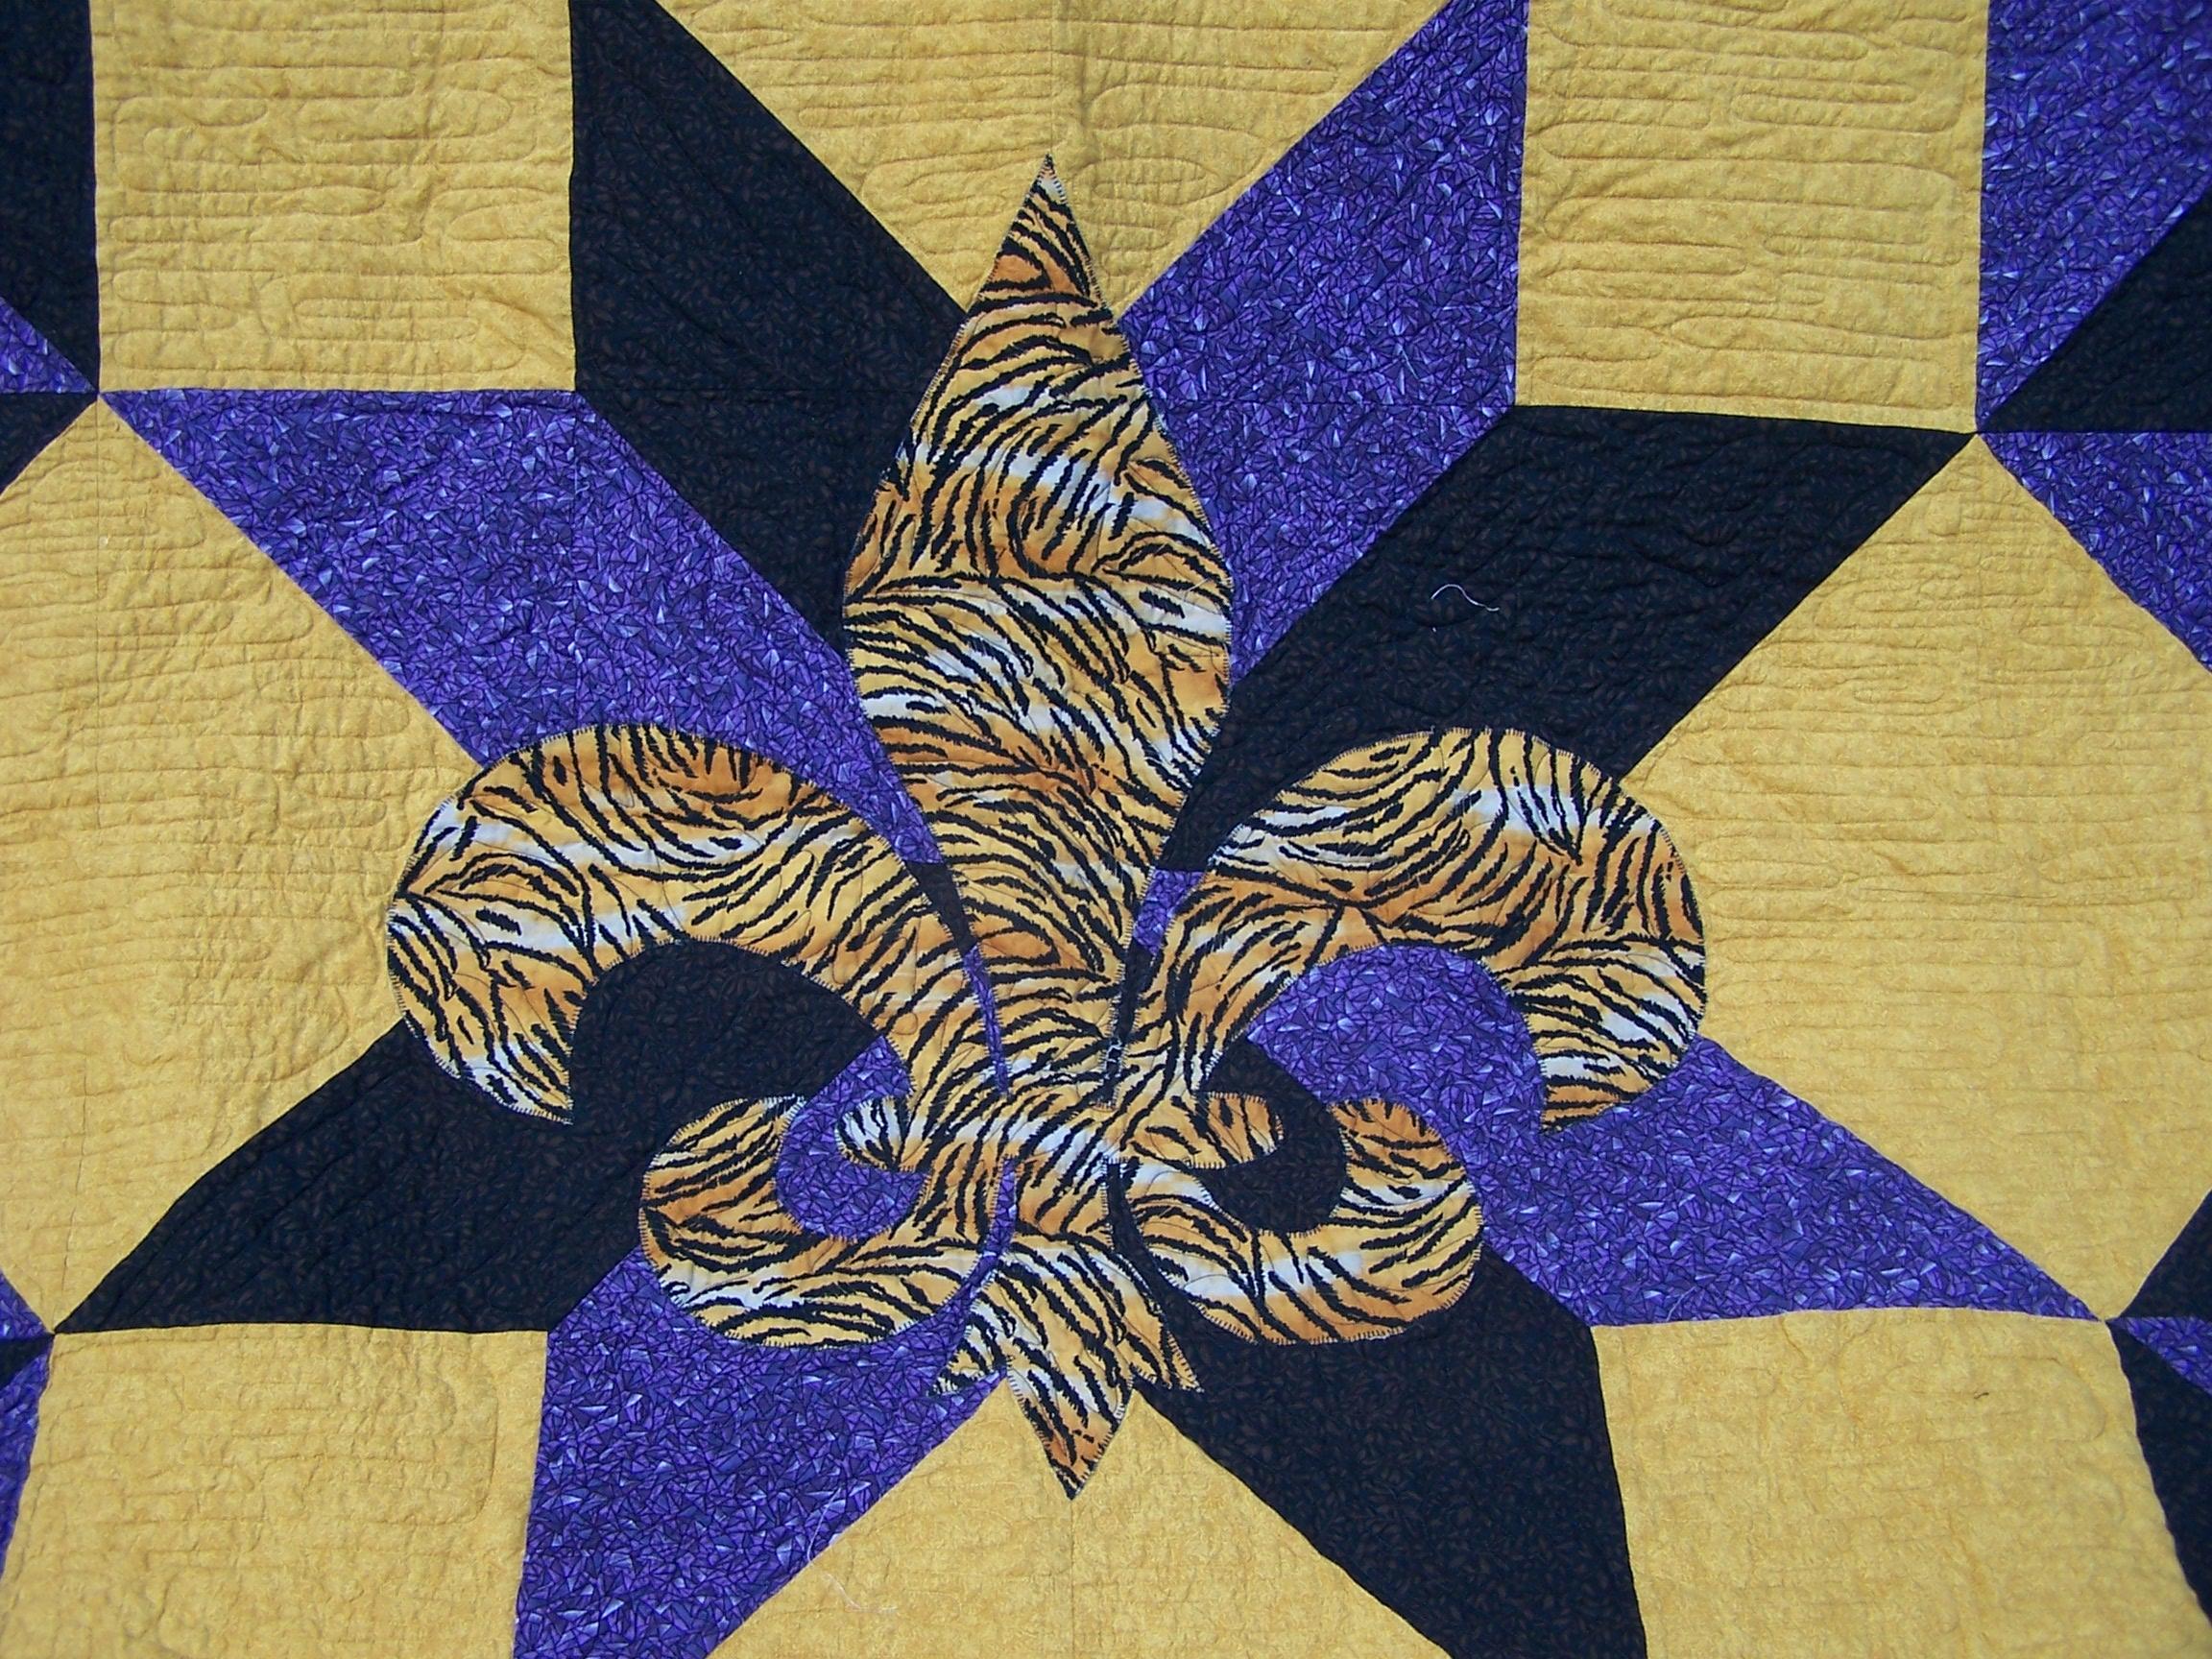 Star of the Tiger - Butterfly Angels Quilting : fleur de lis quilt pattern - Adamdwight.com